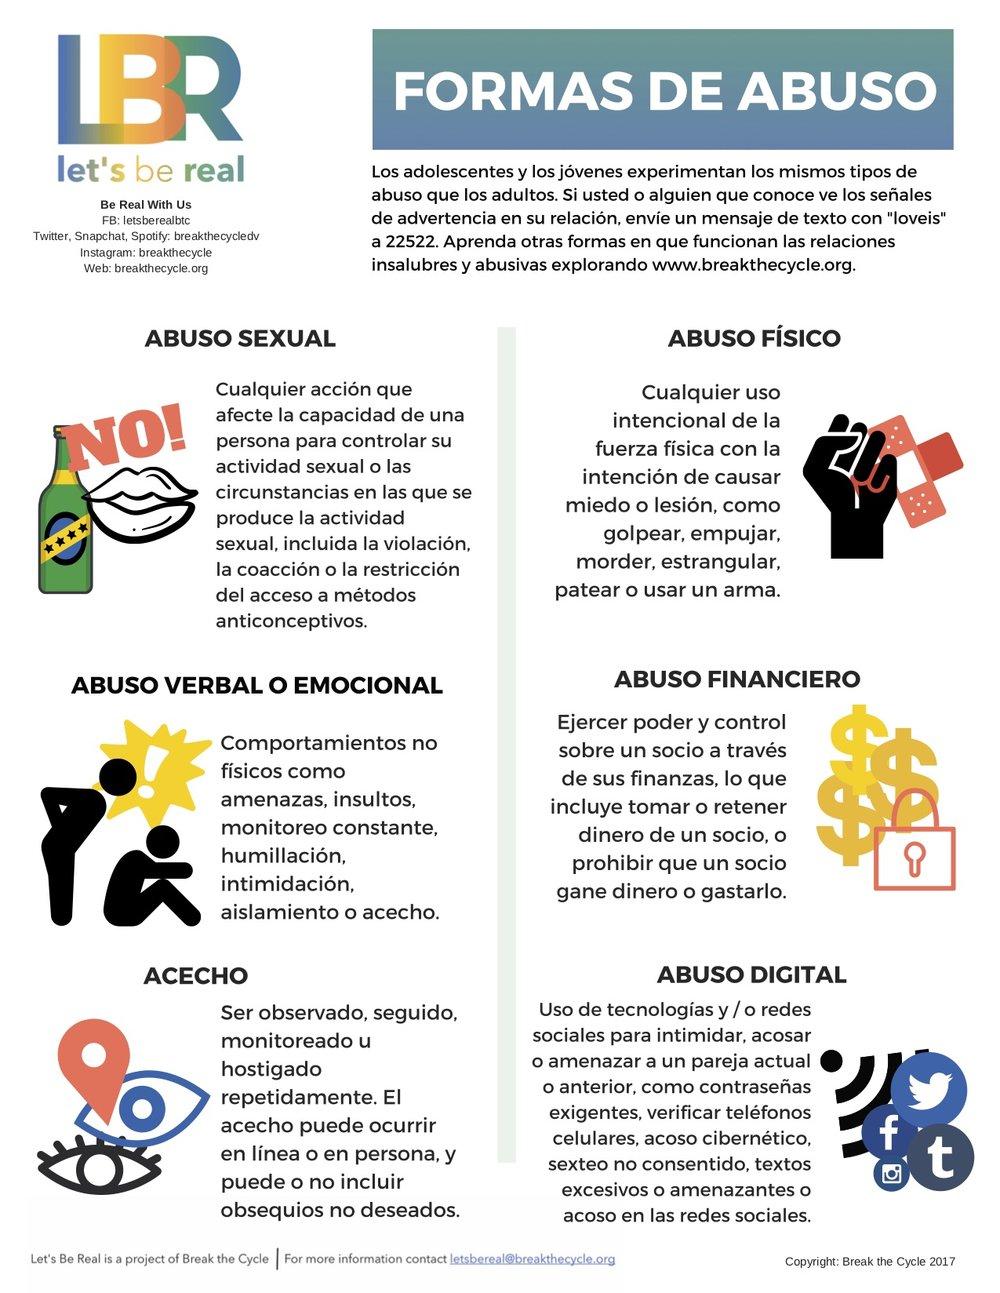 Forms of Abuse_es.jpg